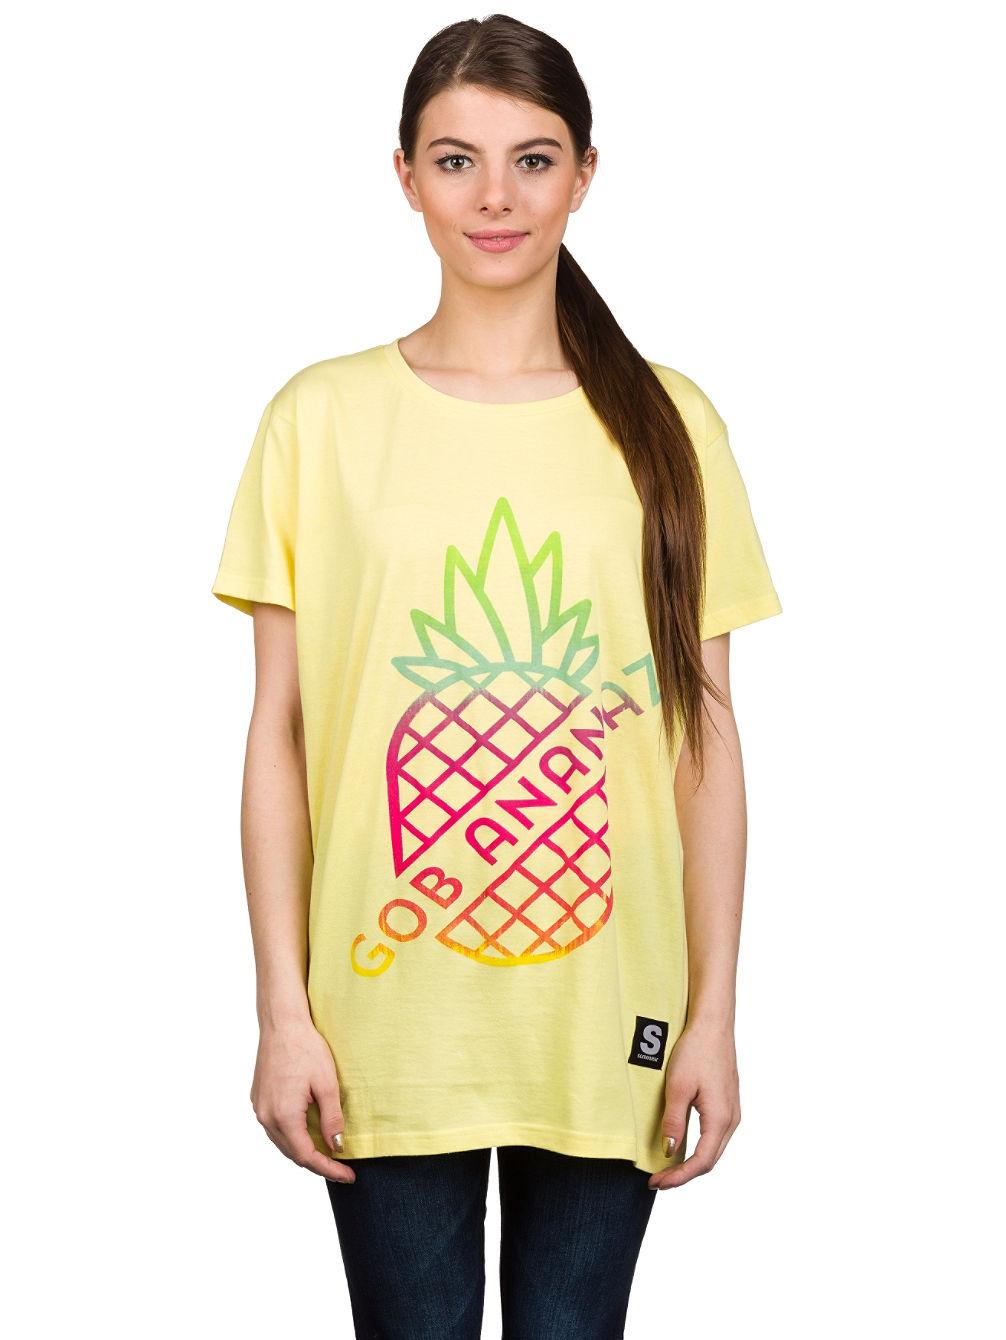 origianl-go-bananaz-t-shirt